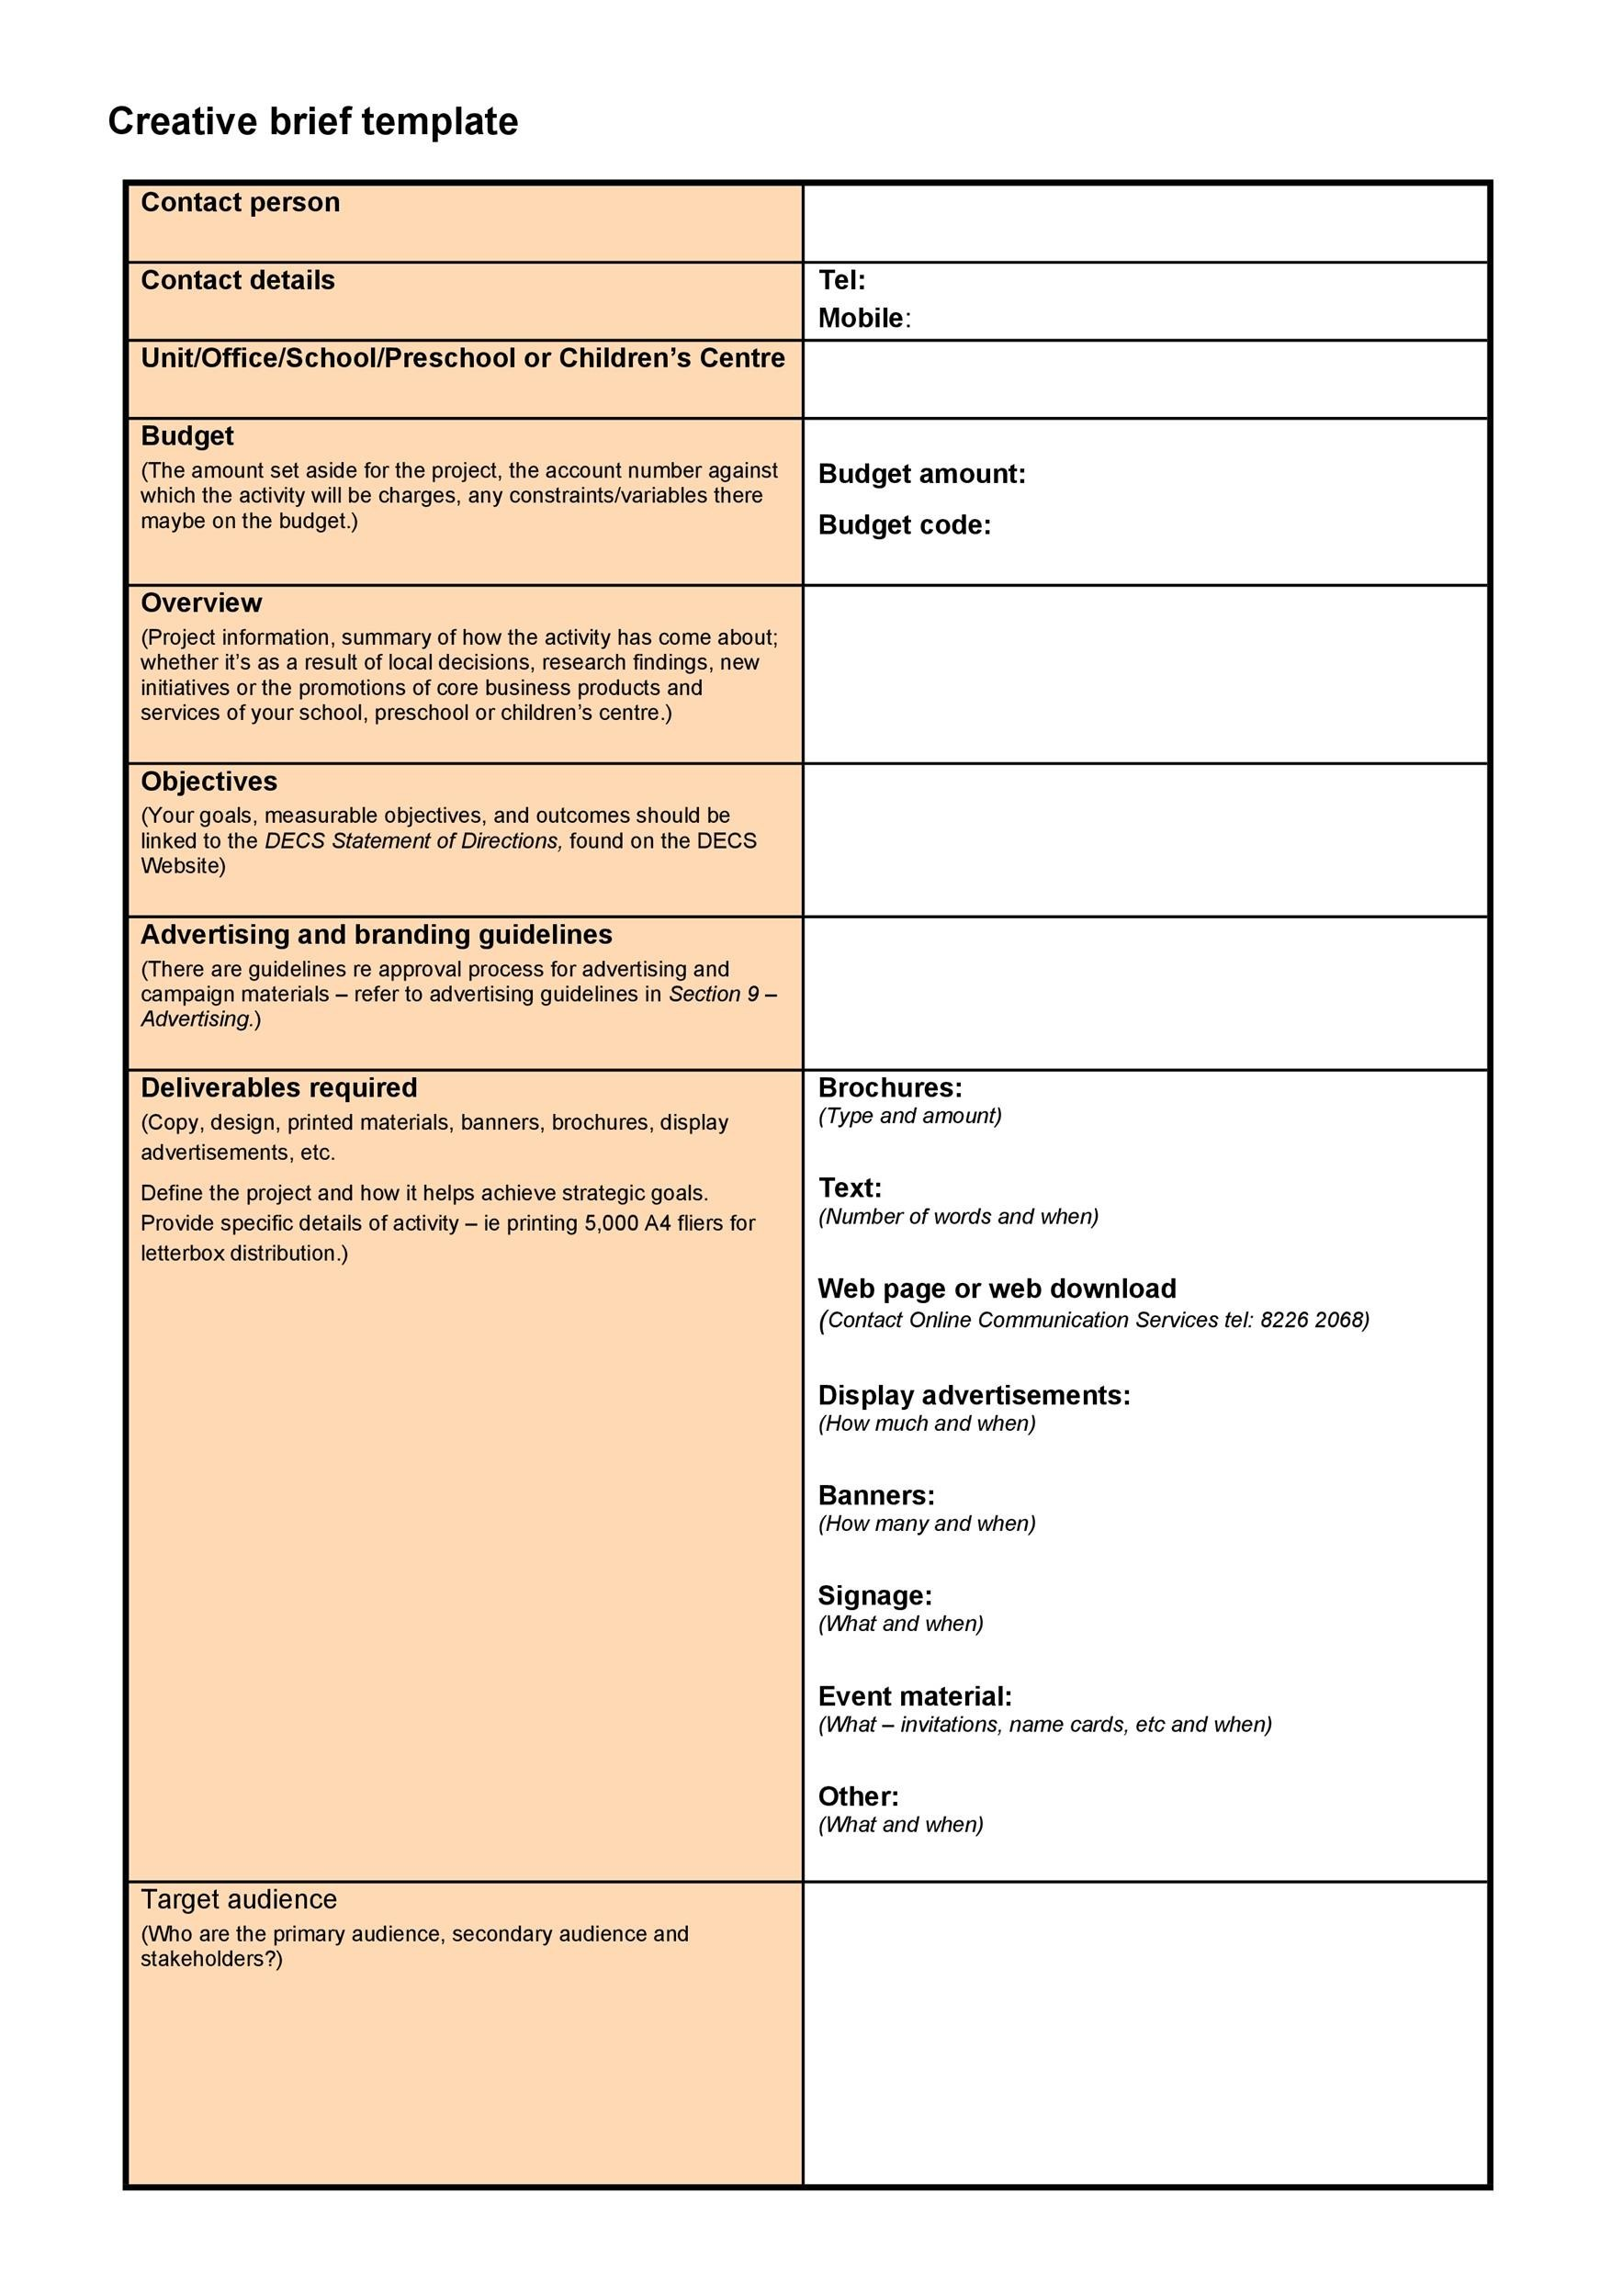 Free design brief template 41